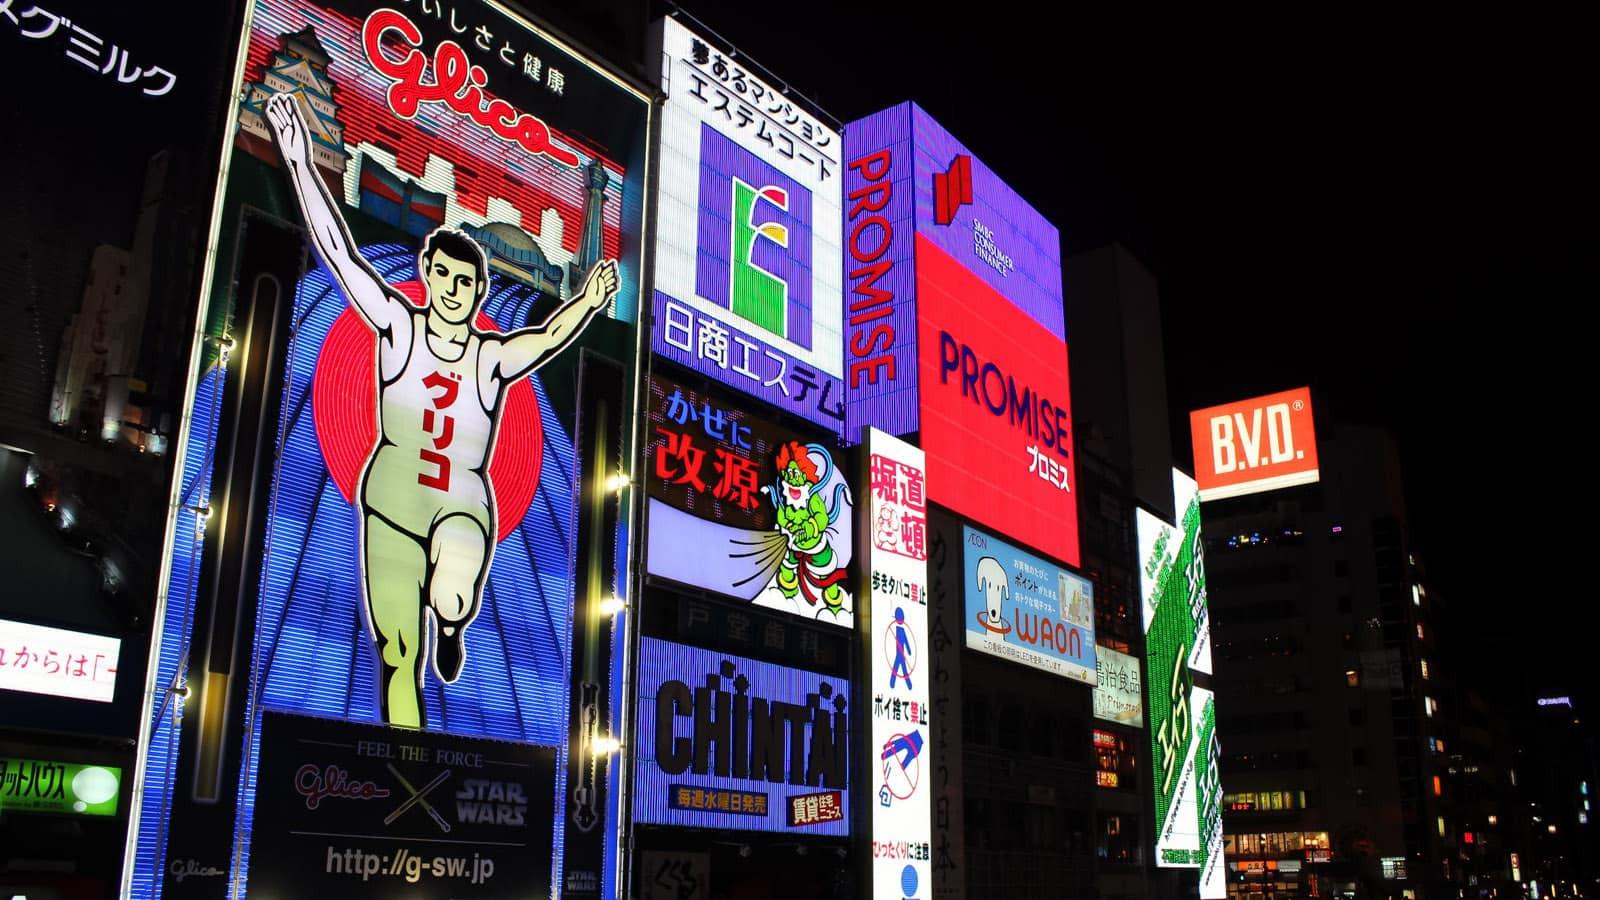 Japonska umika krizno stanje iz prefektur Kyoto, Osaka in Hyogo